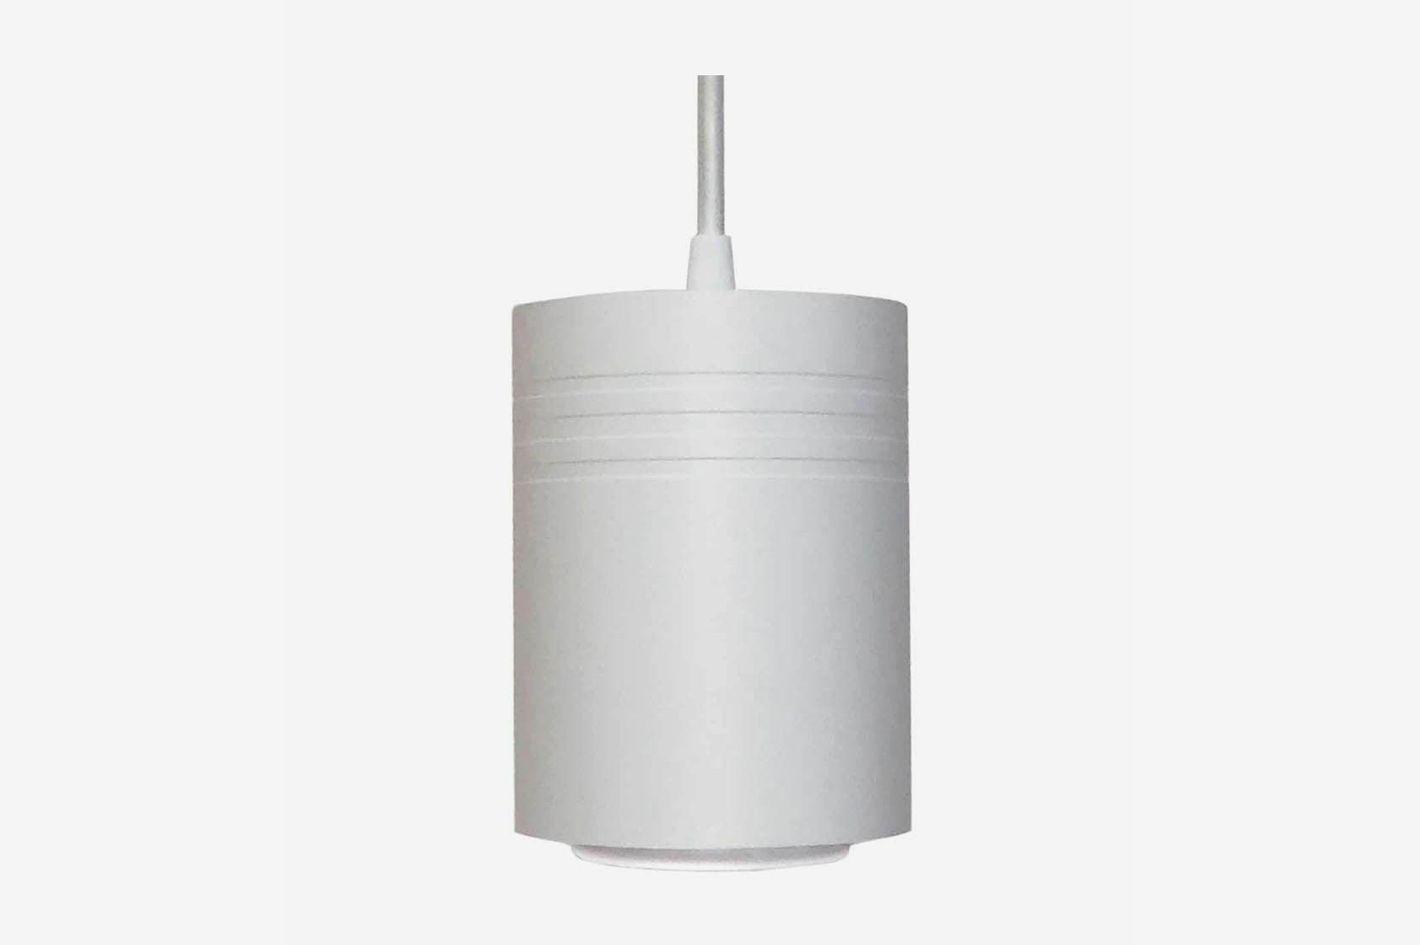 White Aspect 20W Luxury LED Grow Light